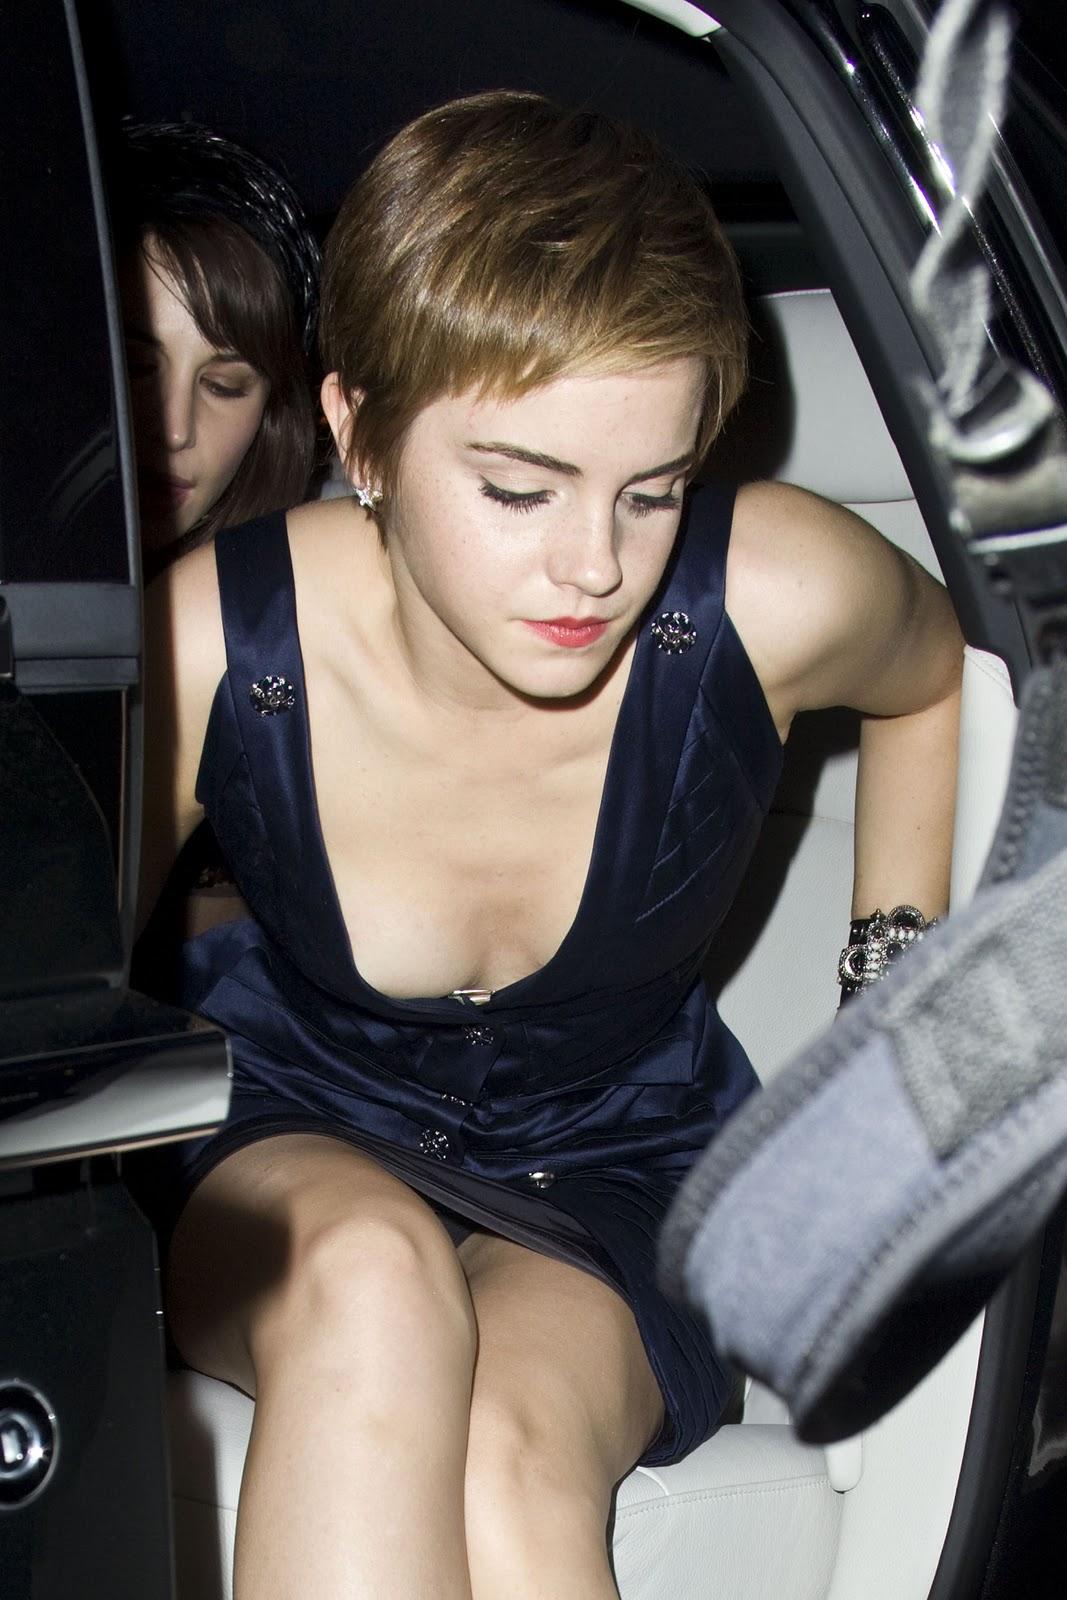 Emma Watson Wardrobe Malfunction | Emma Watson nip slip |